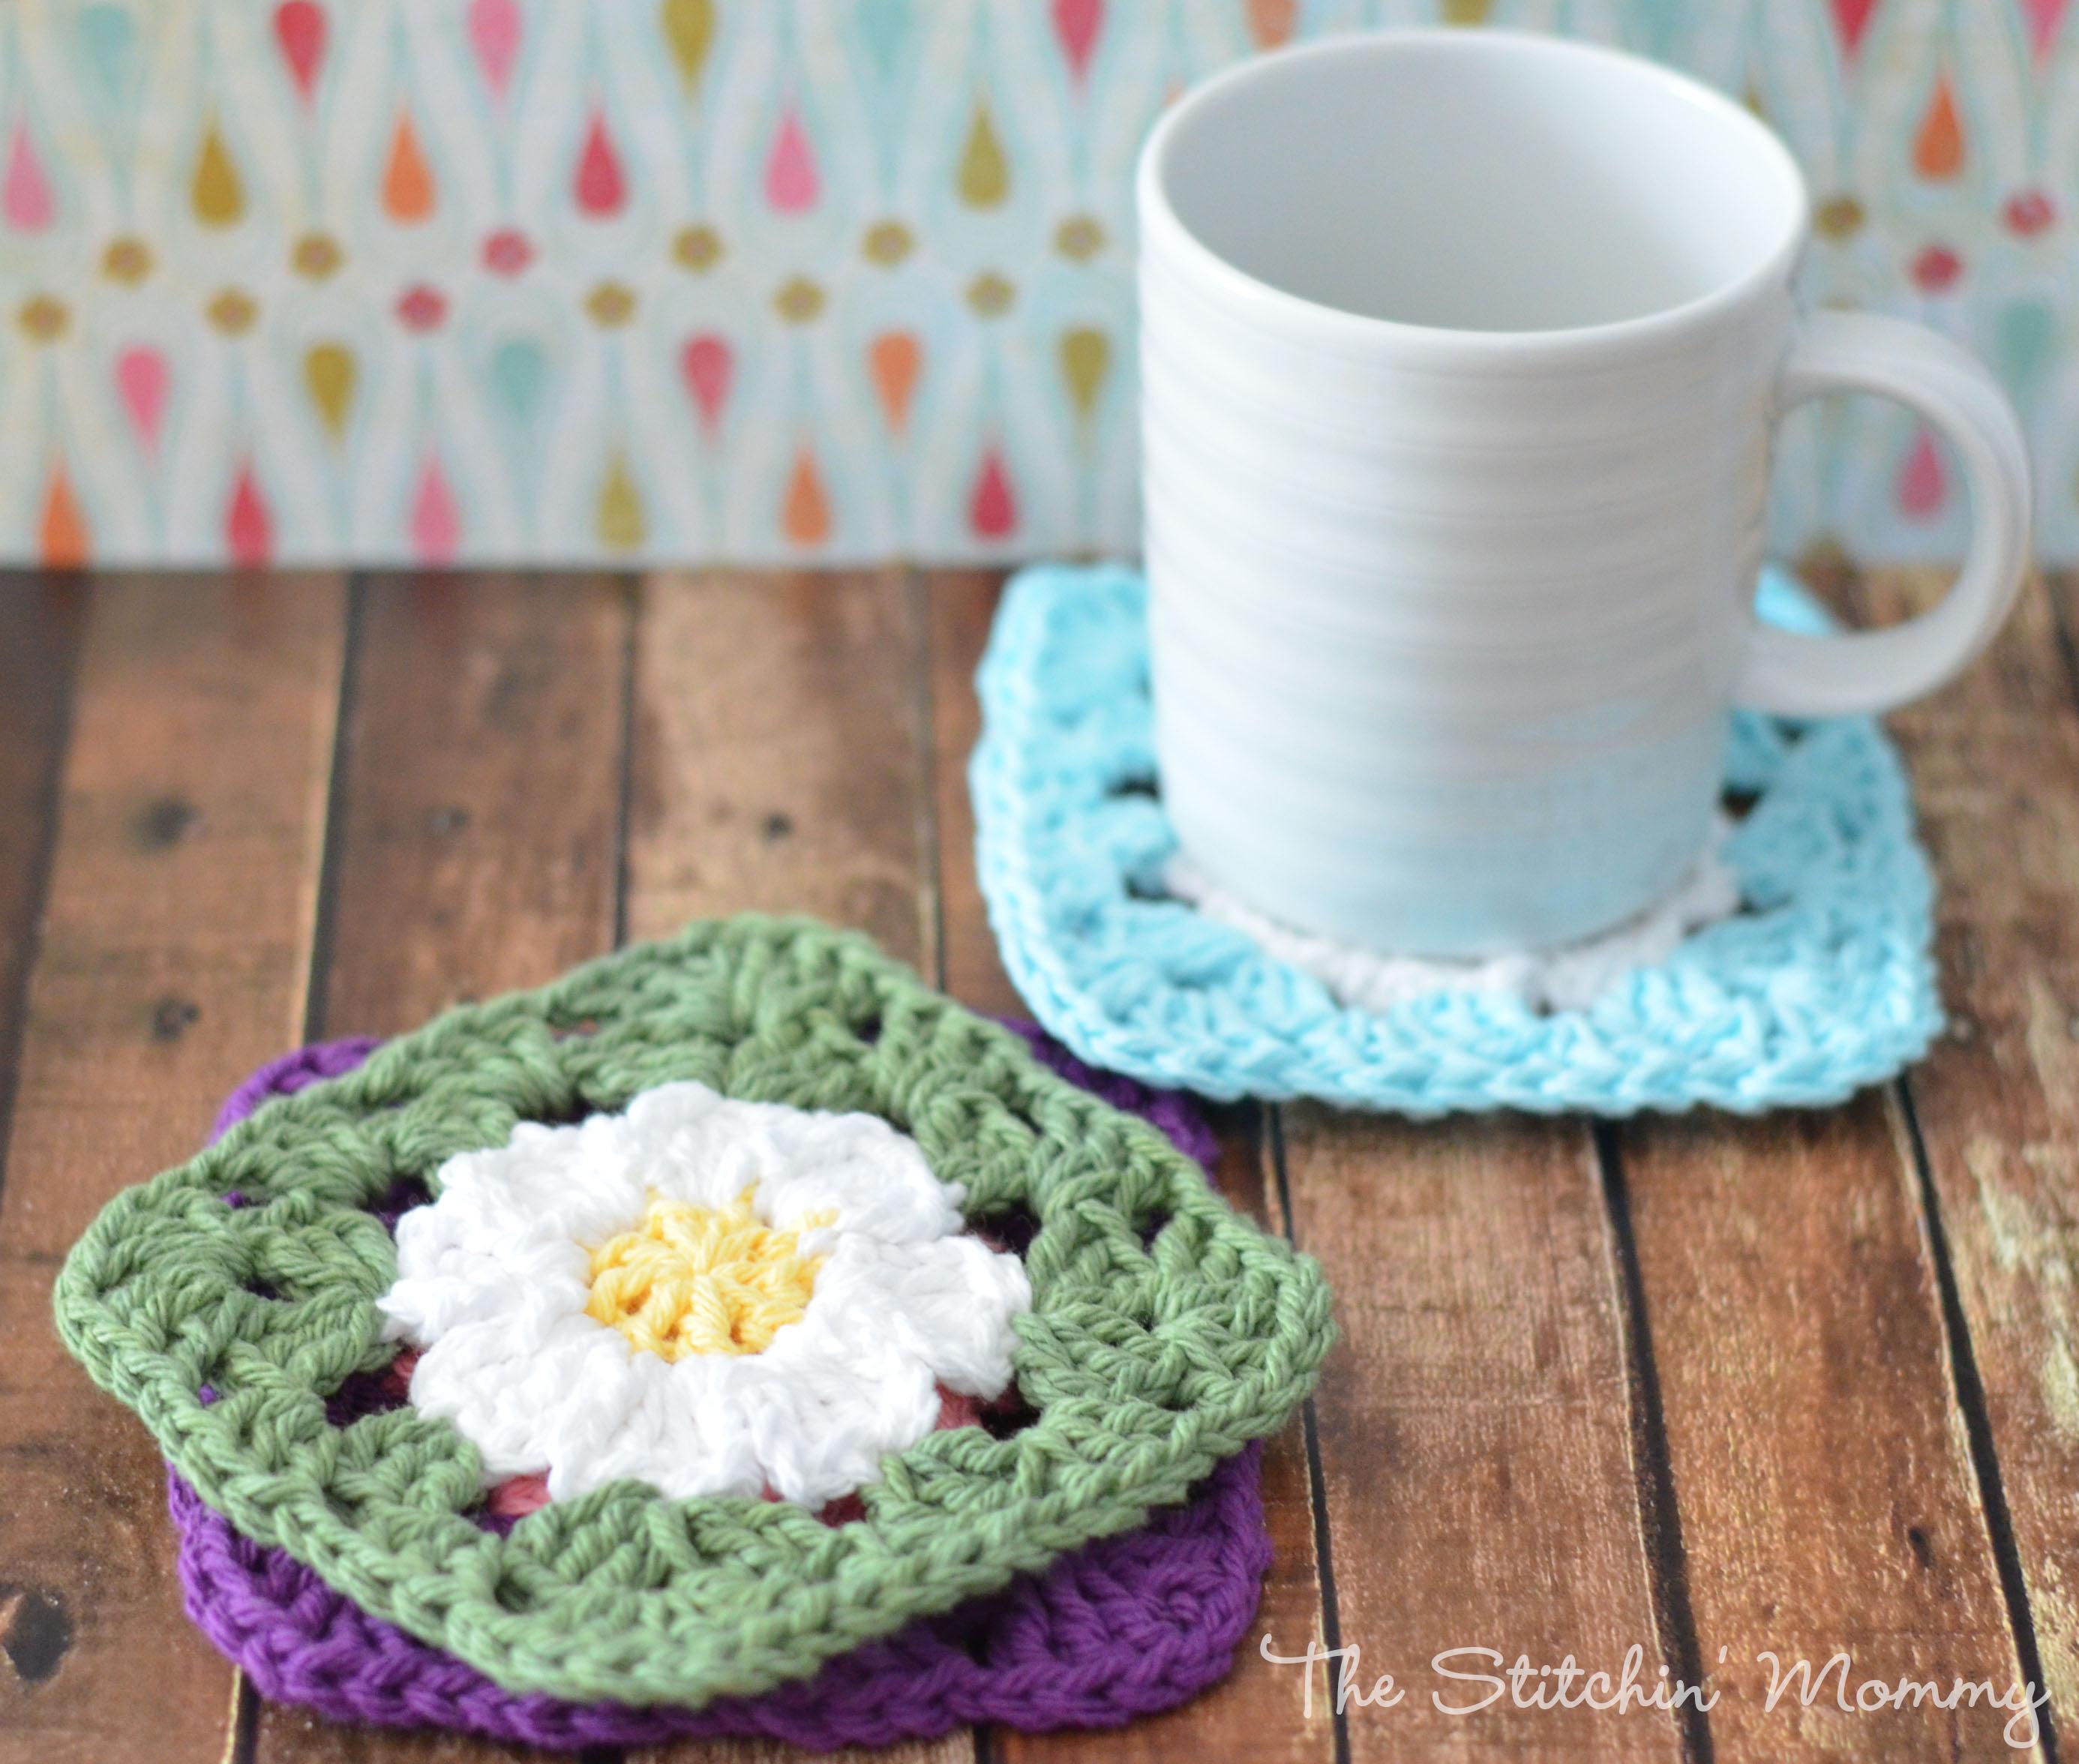 Crochet Daisy Granny Squares - The Stitchin Mommy